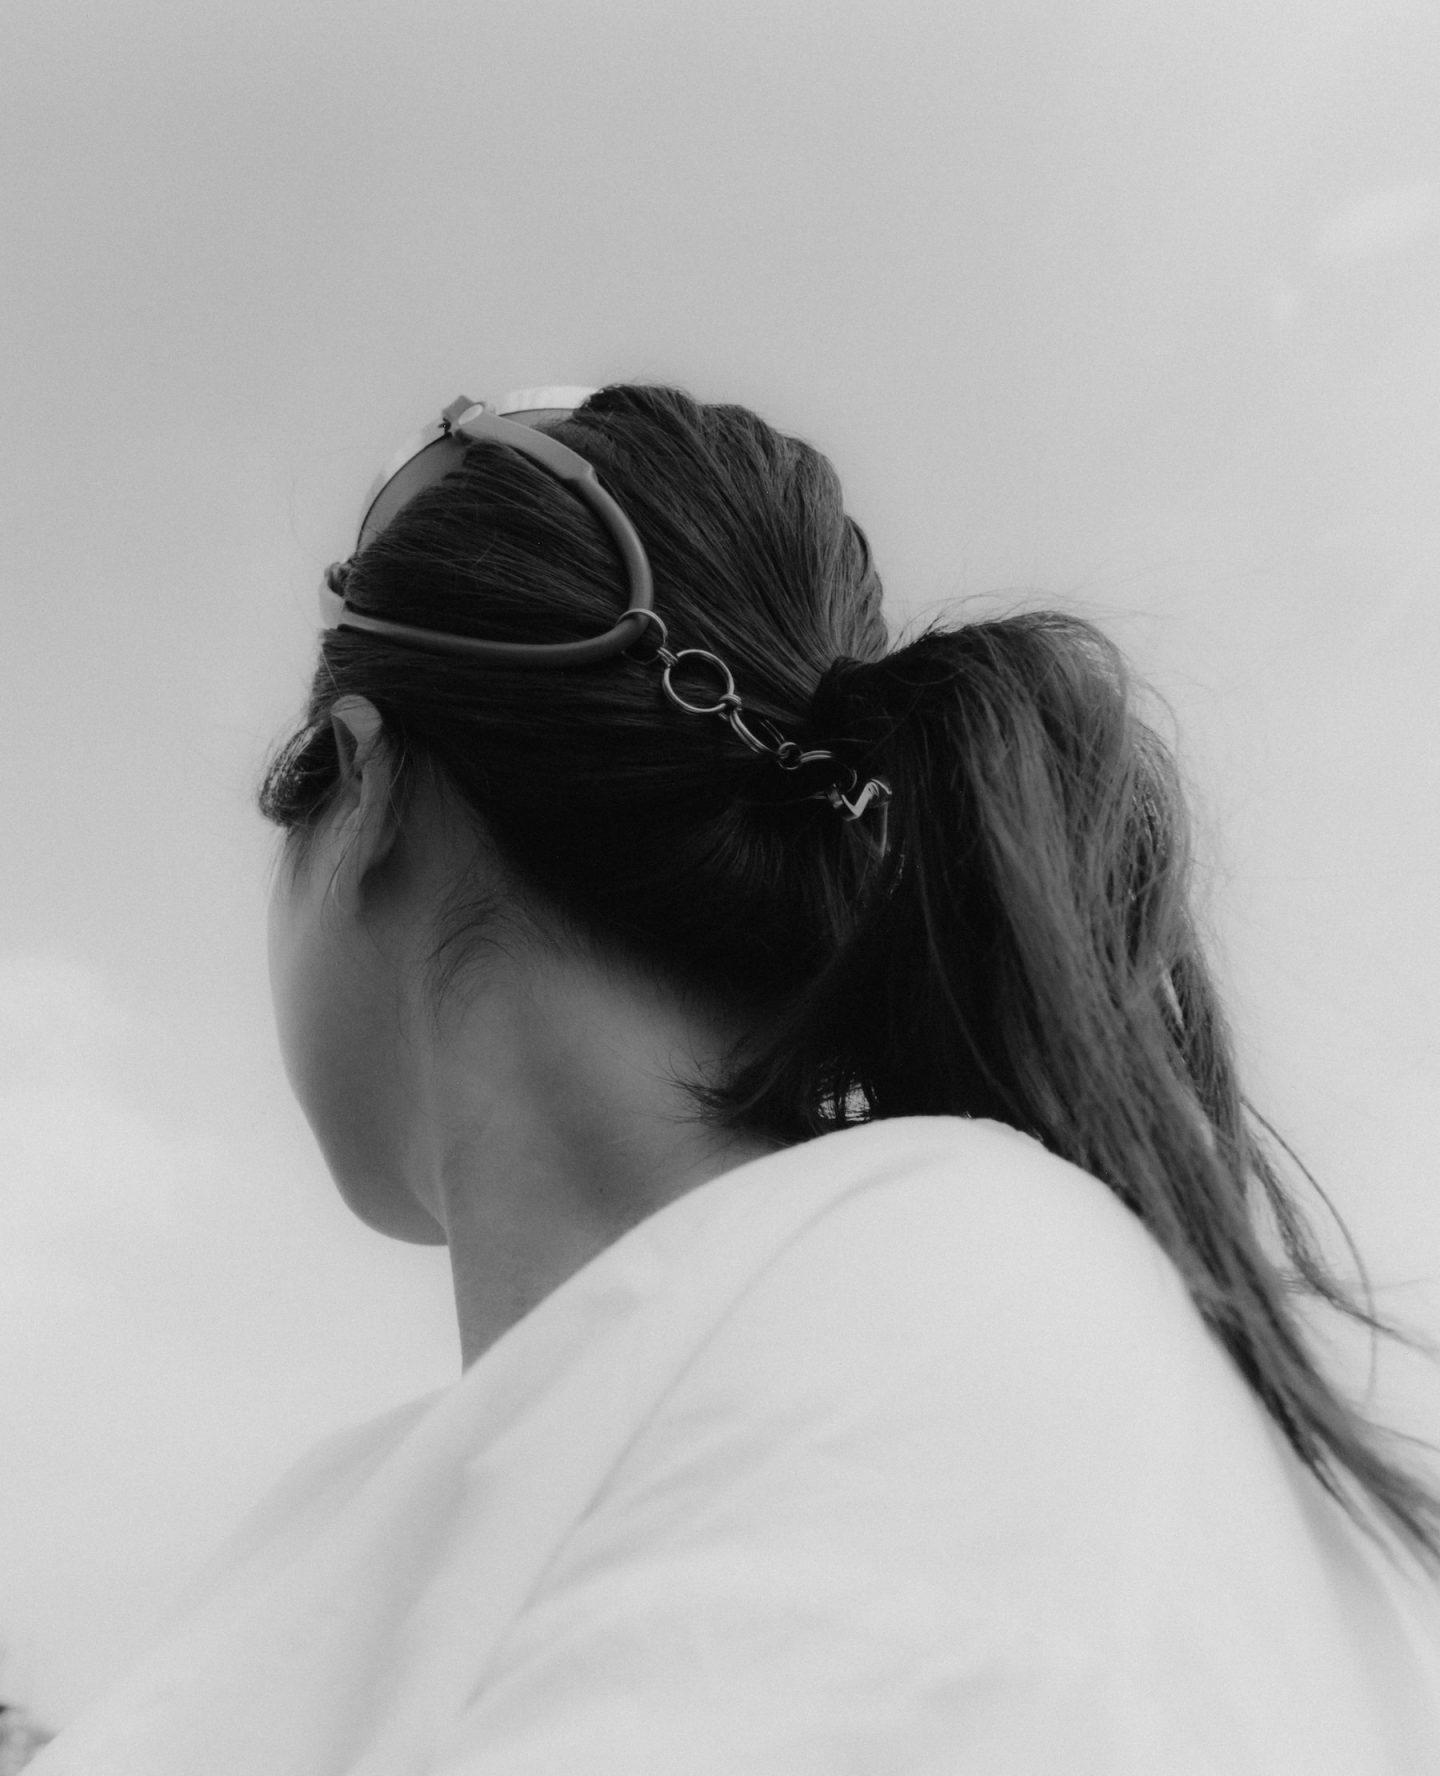 IGNANT-Photography-Stefan-Dotter-Sea-Women-Japan-010